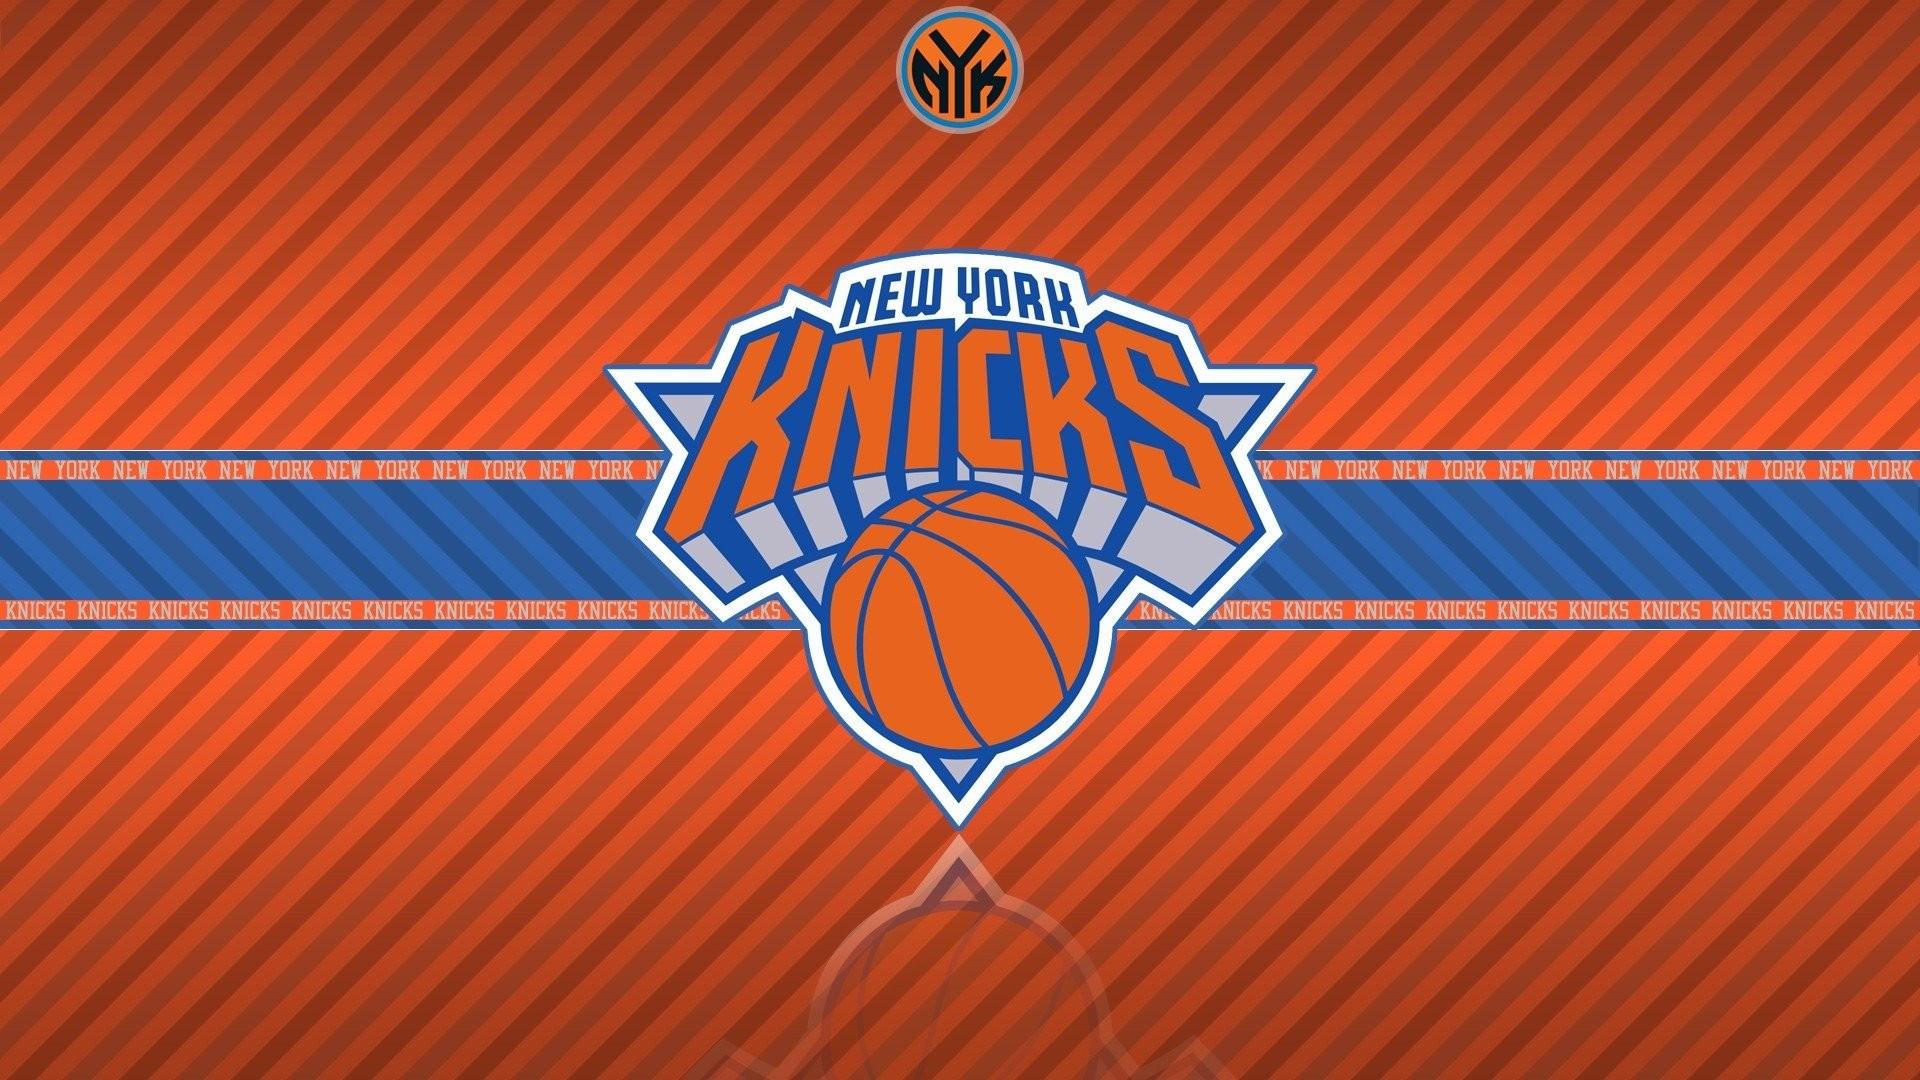 583bf15aa8a NY Knicks Wallpaper or Screensavers (75+ images)